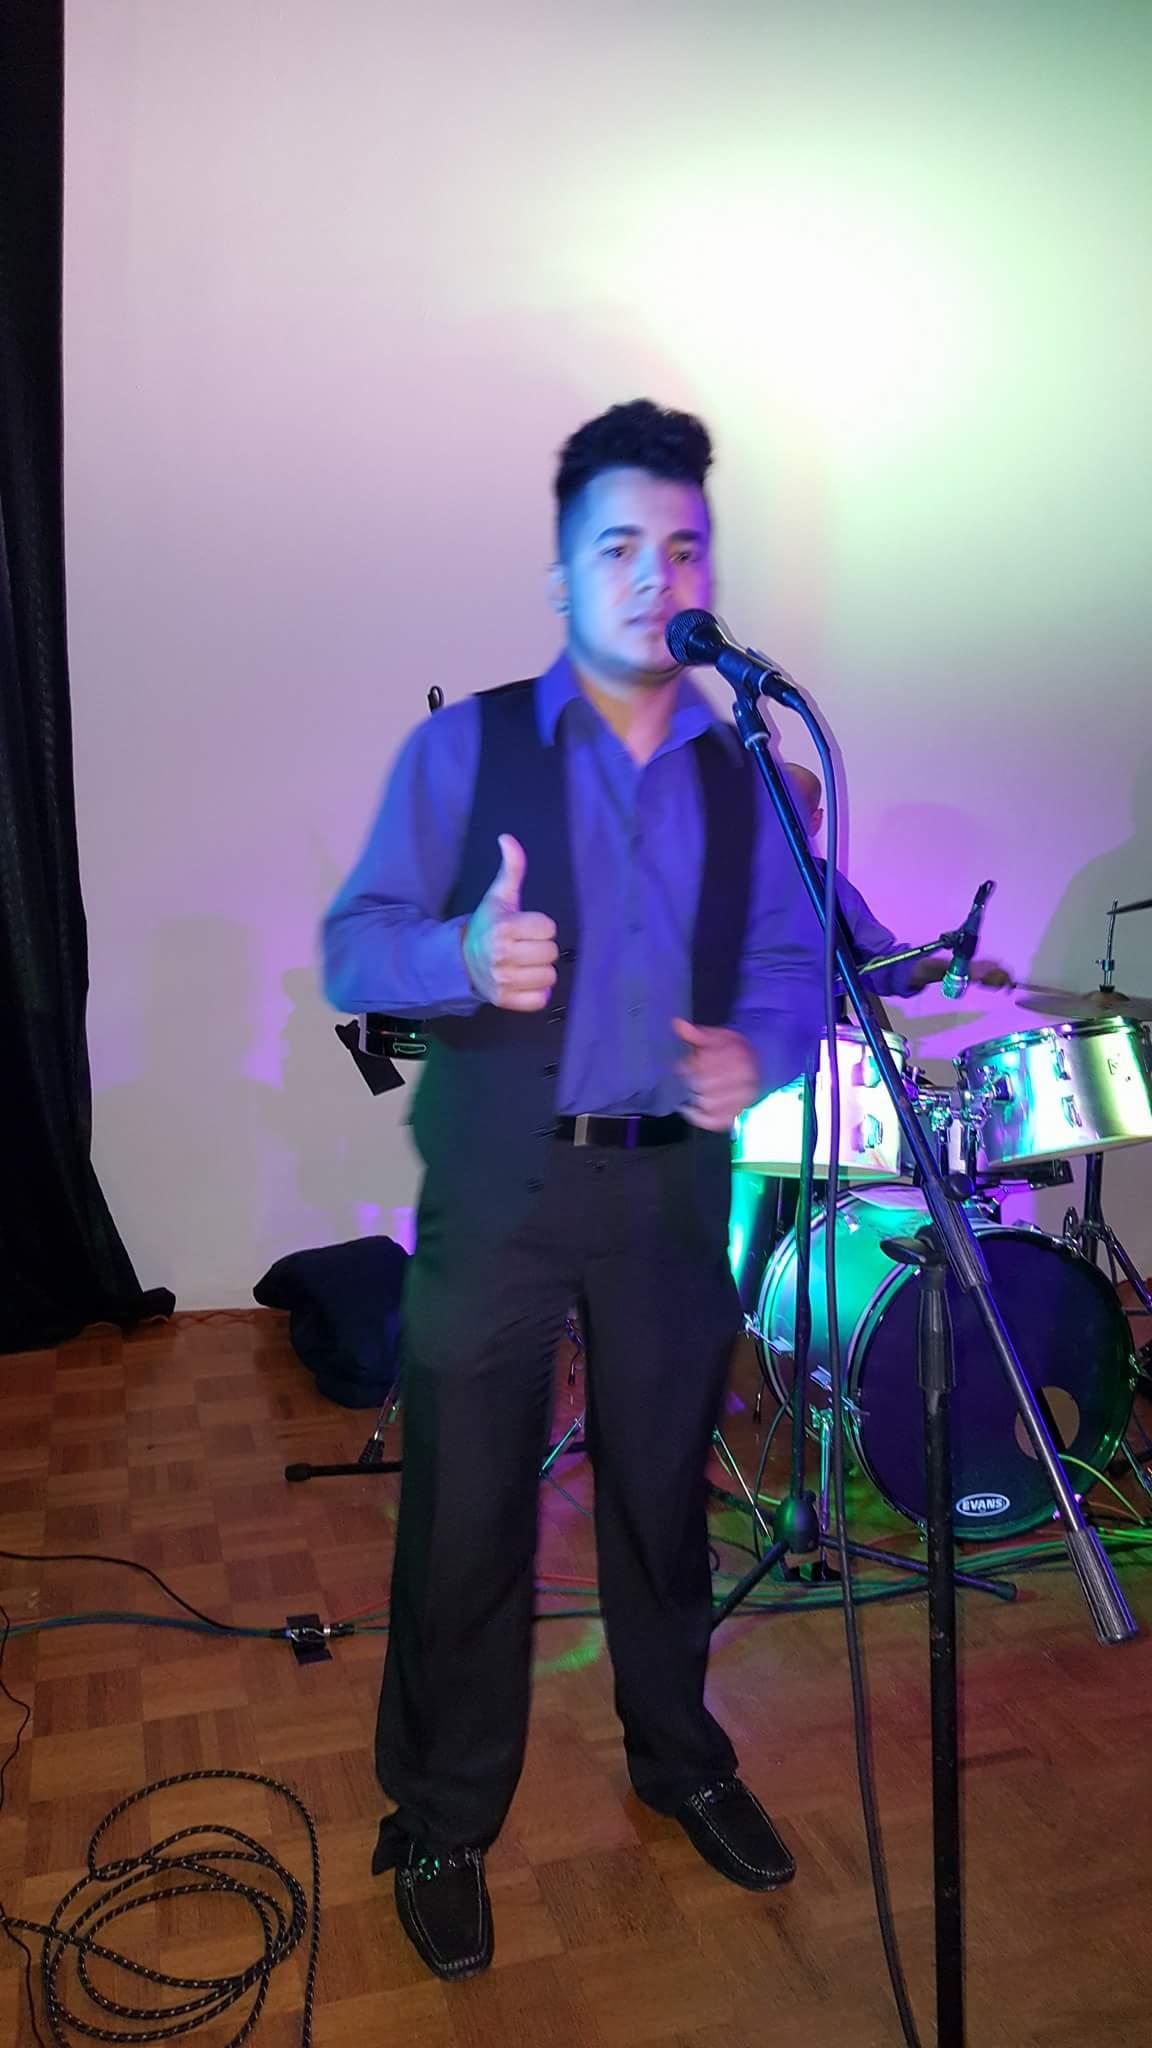 2. Lito Najarro (408017)